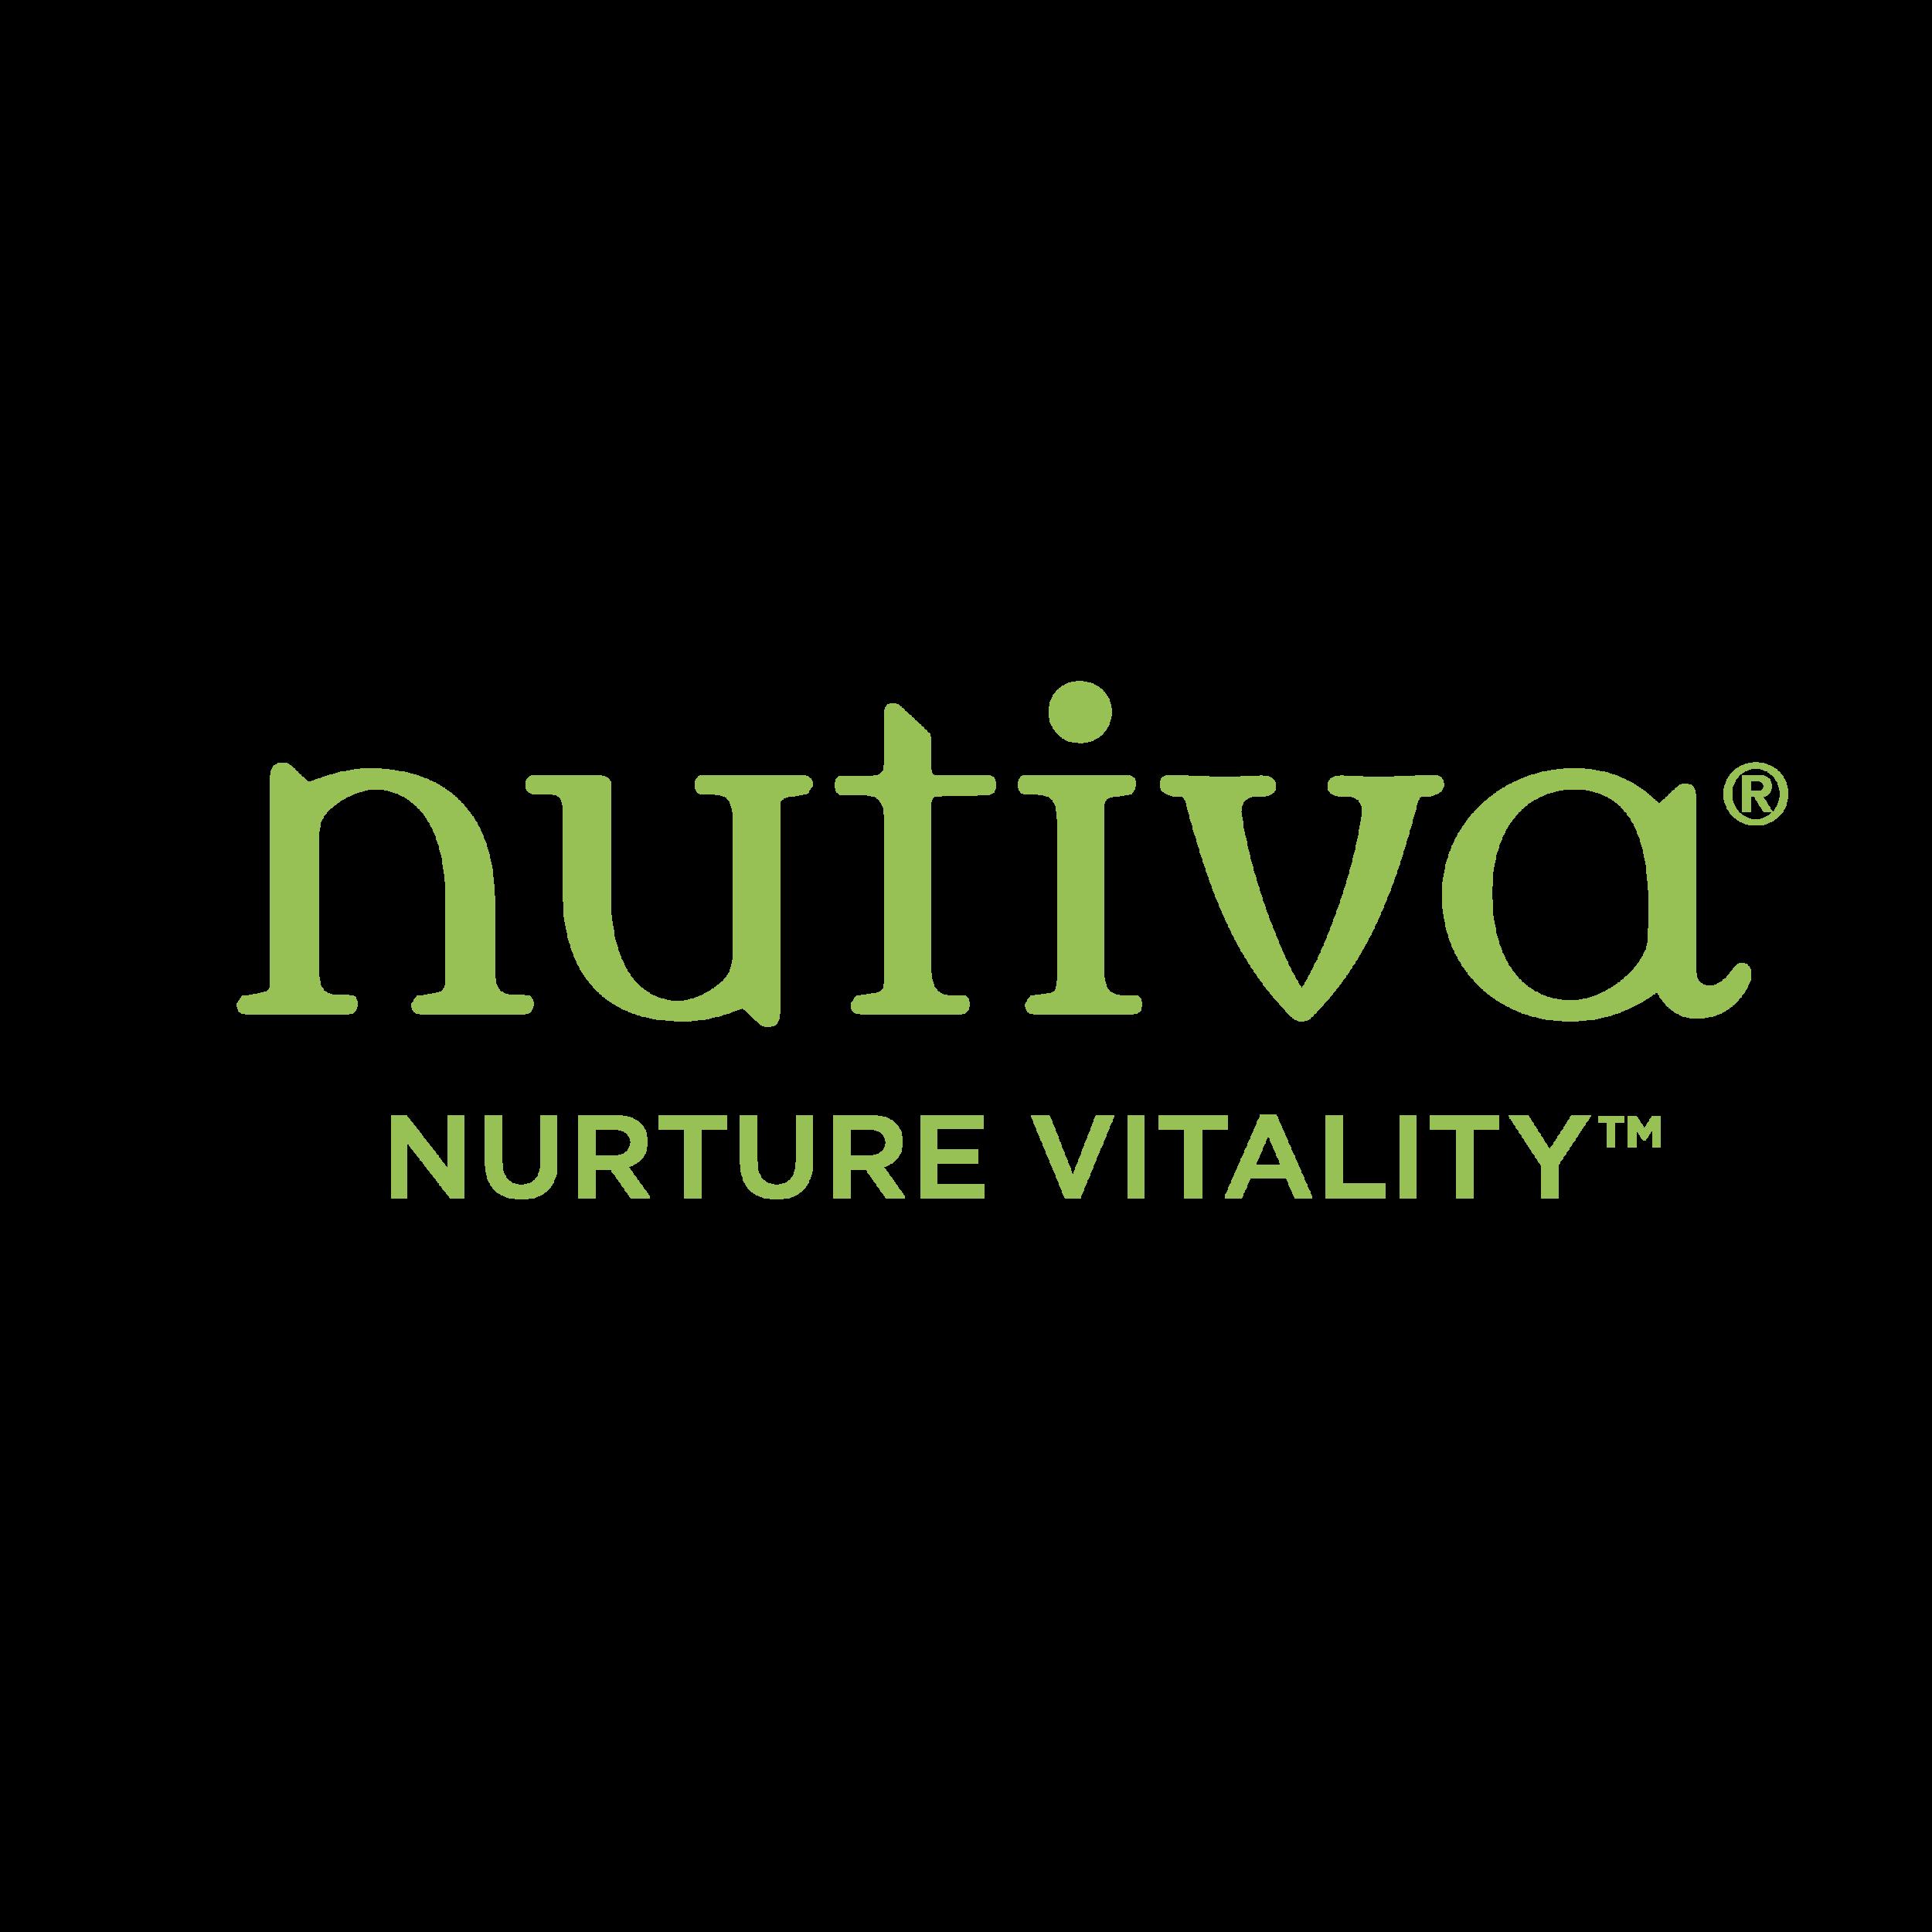 nutiva logo.png